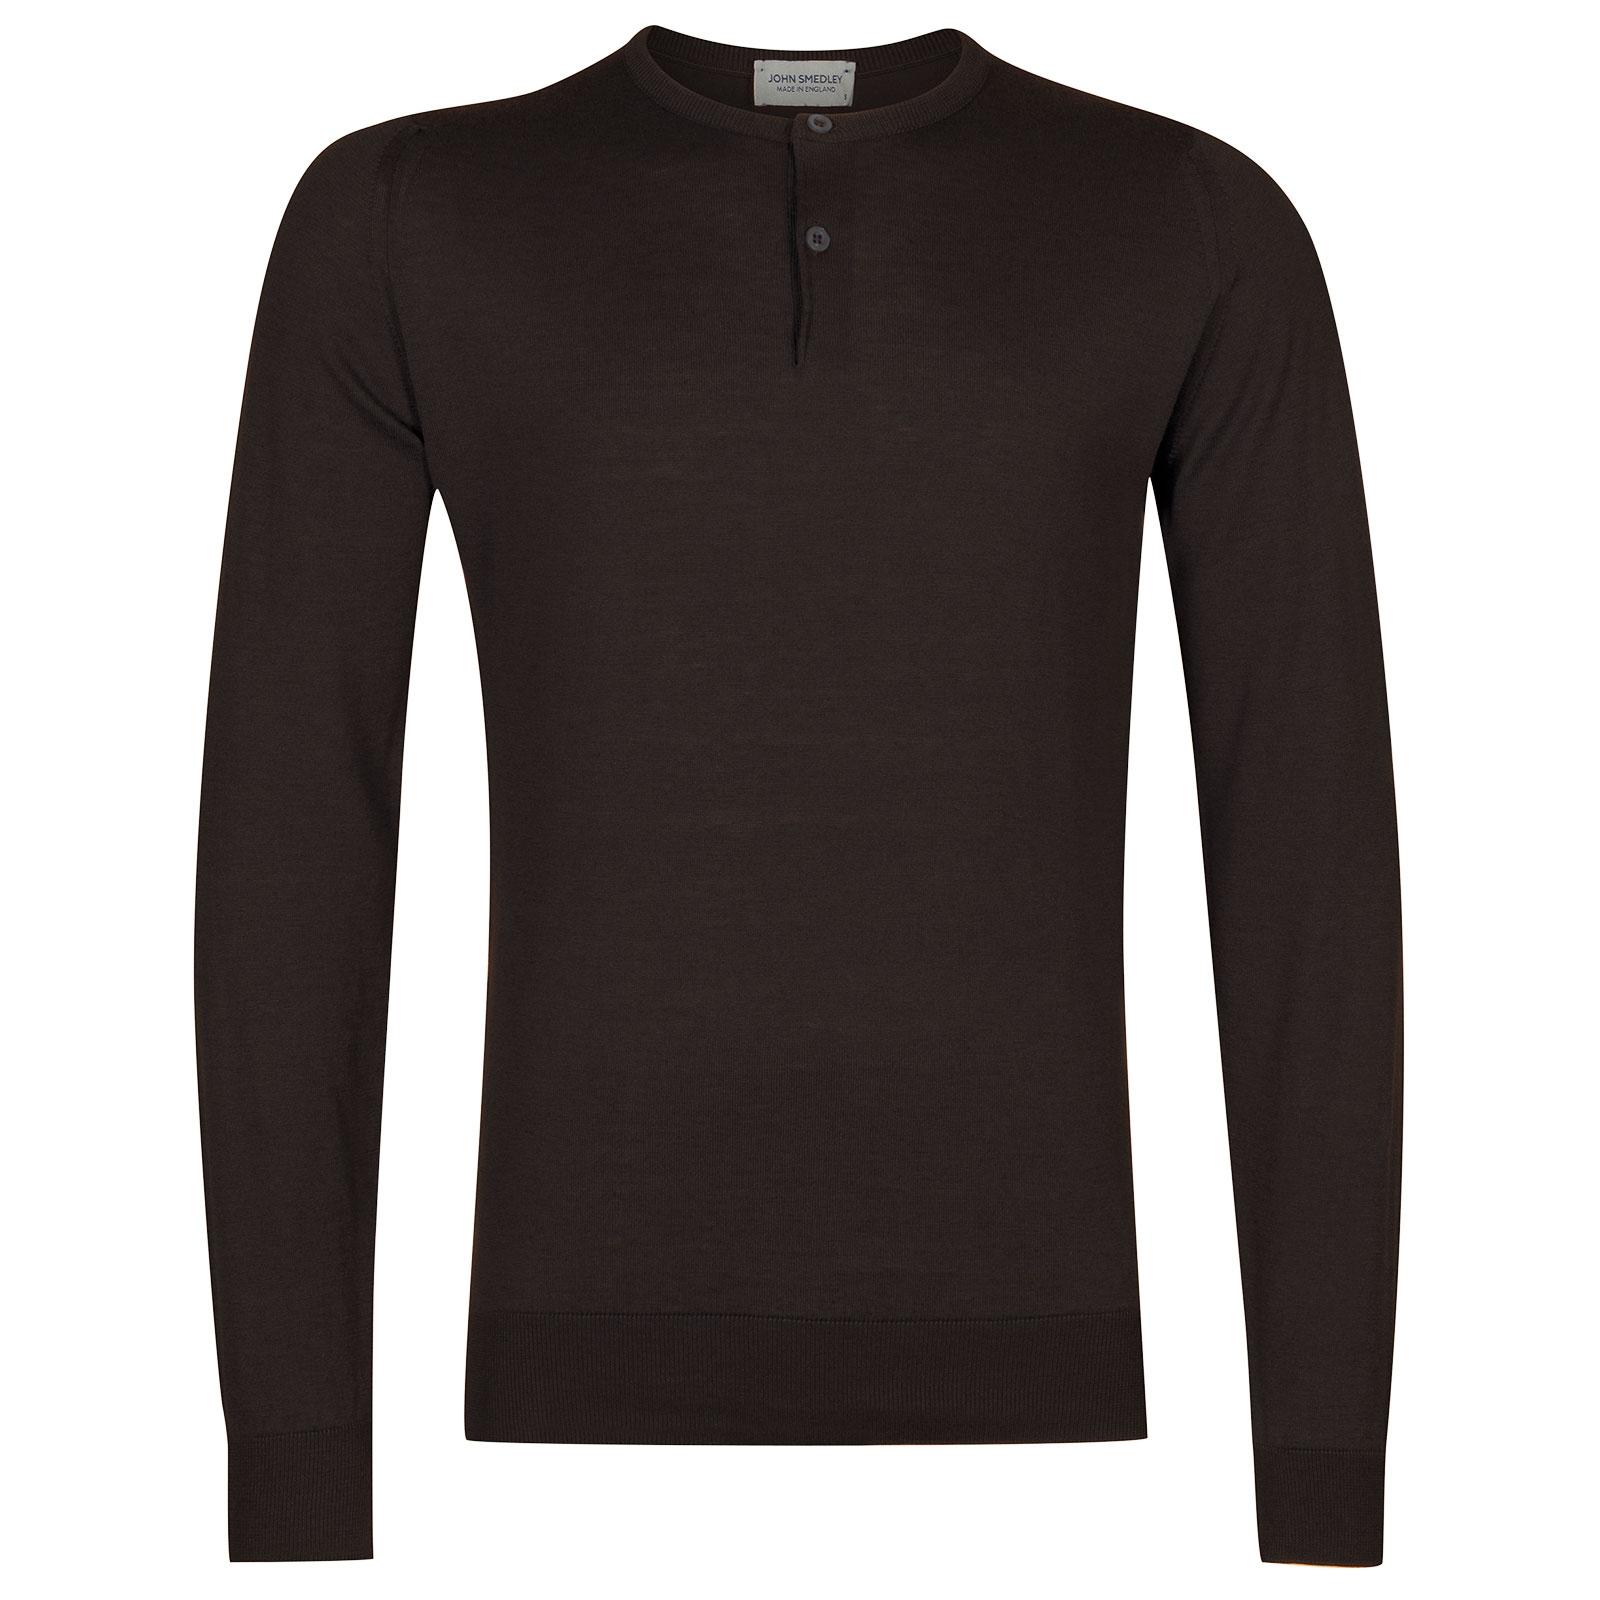 John Smedley Wembury Sea Island Cotton Pullover in Dark Leather-L